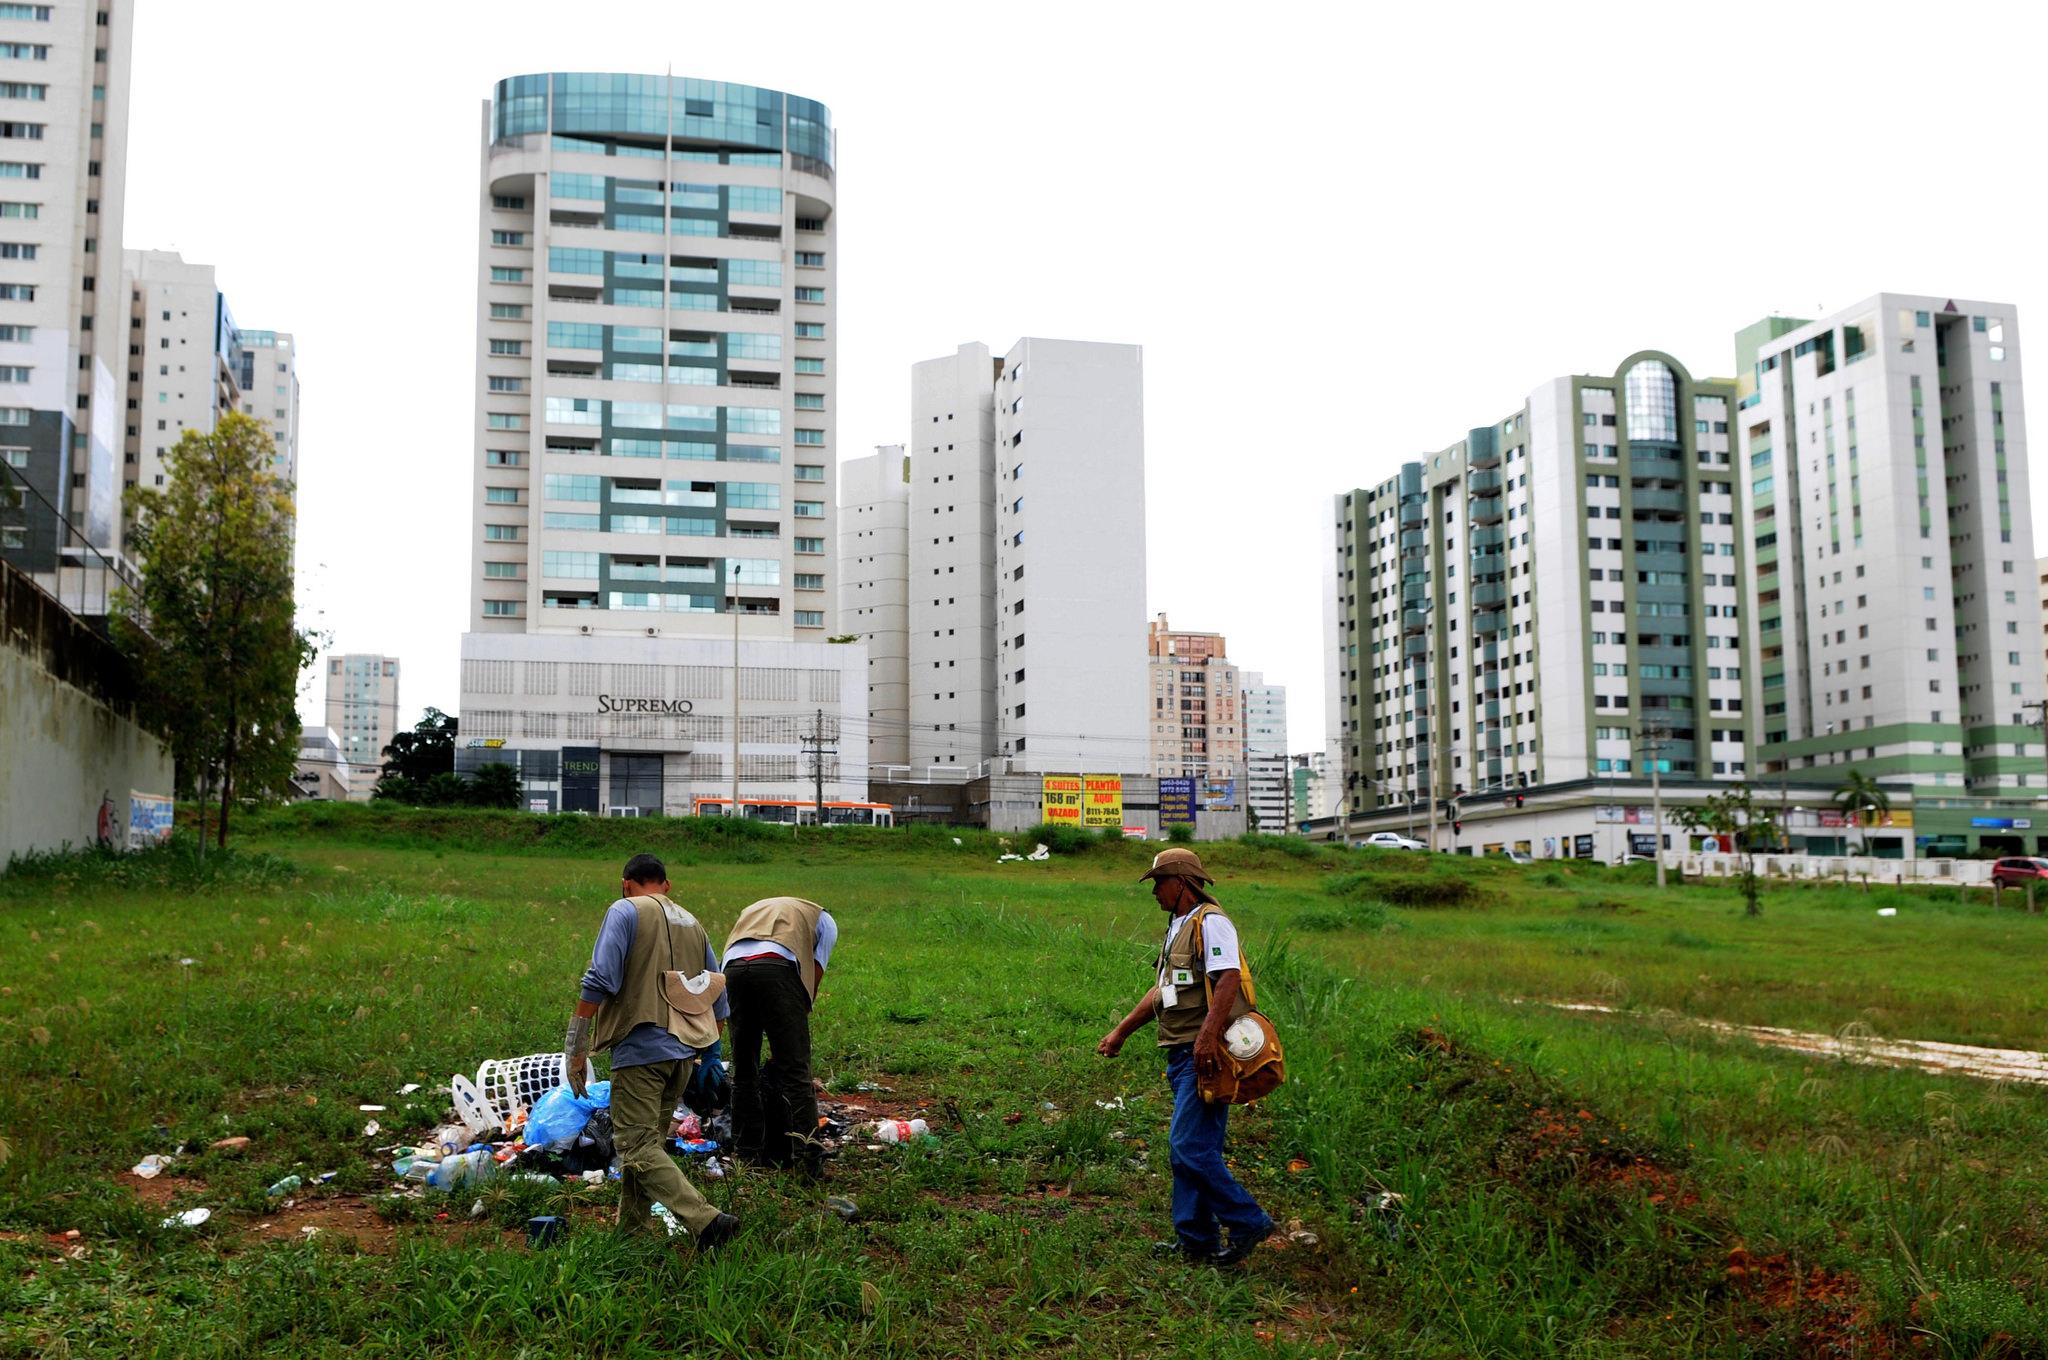 Construction in Brazil. - Agência Brasília (Flickr)